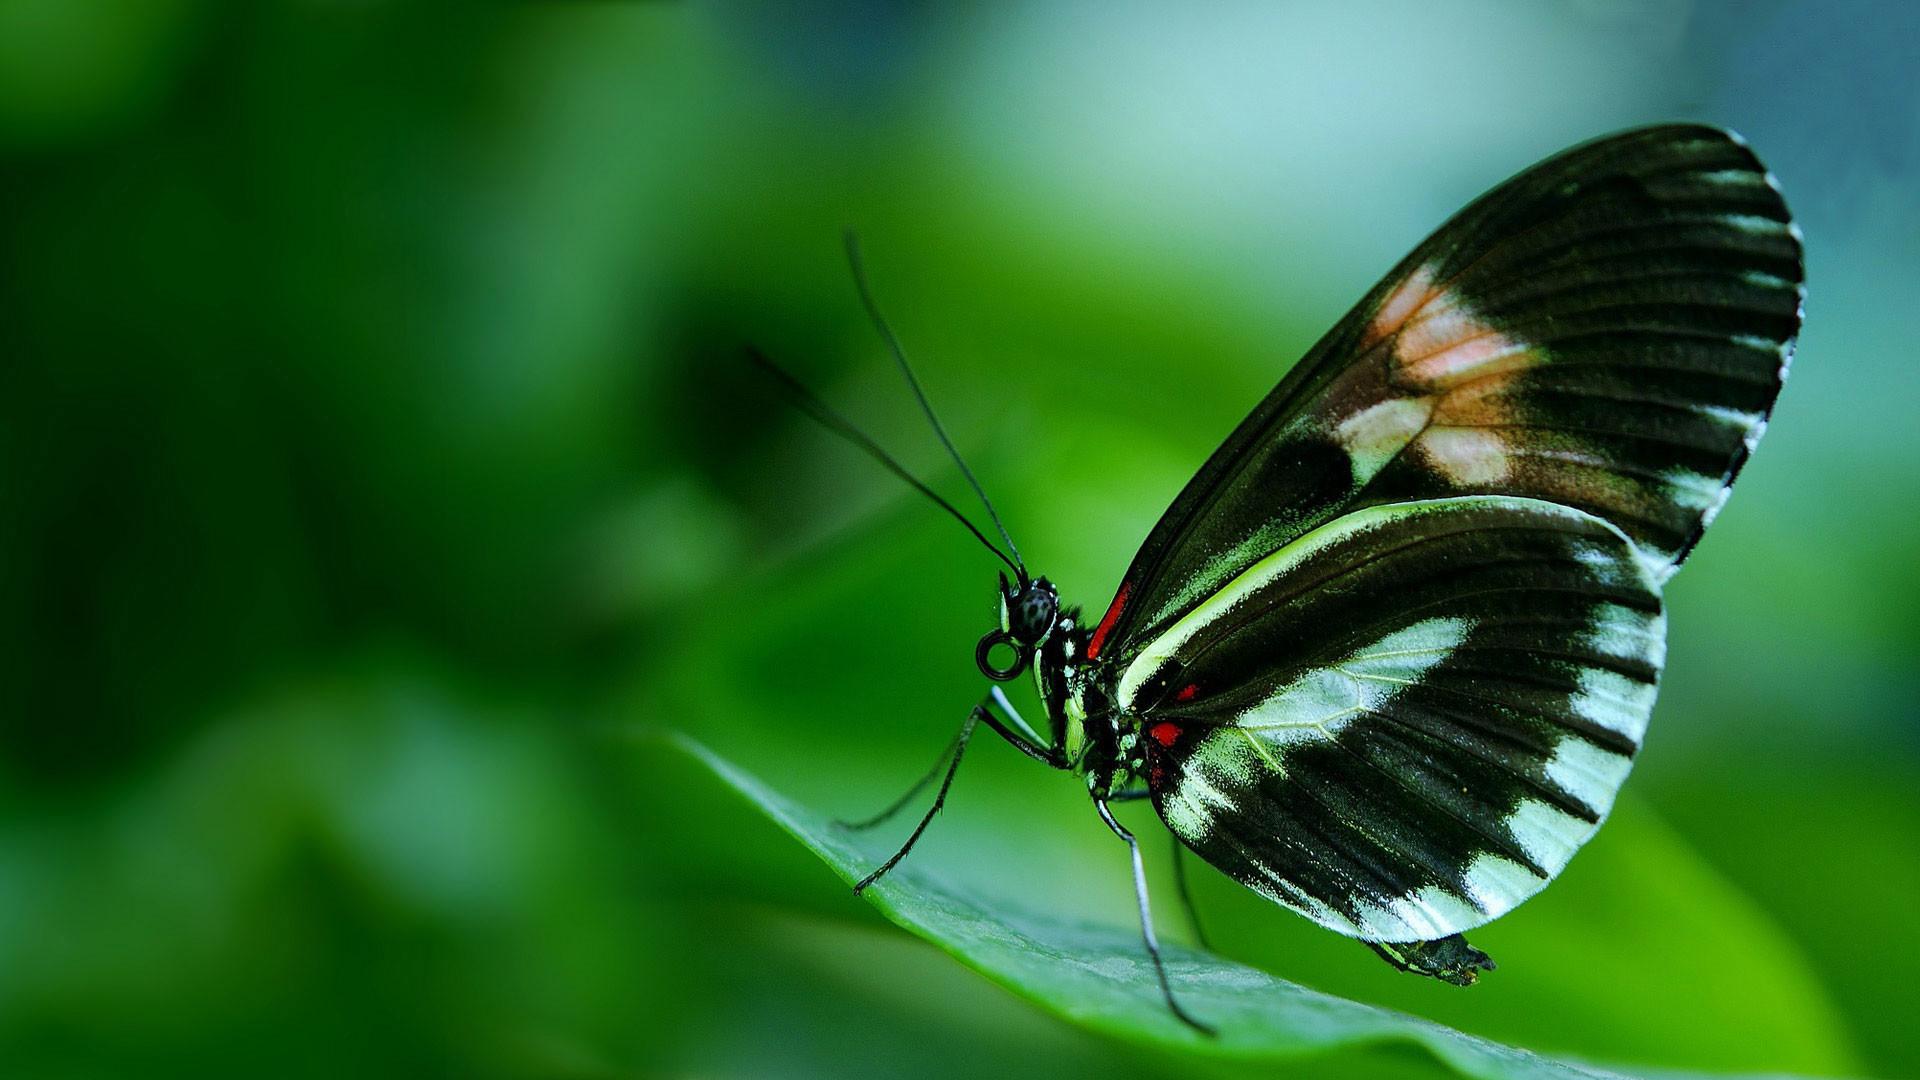 Black Butterfly Wallpaper ·① WallpaperTag